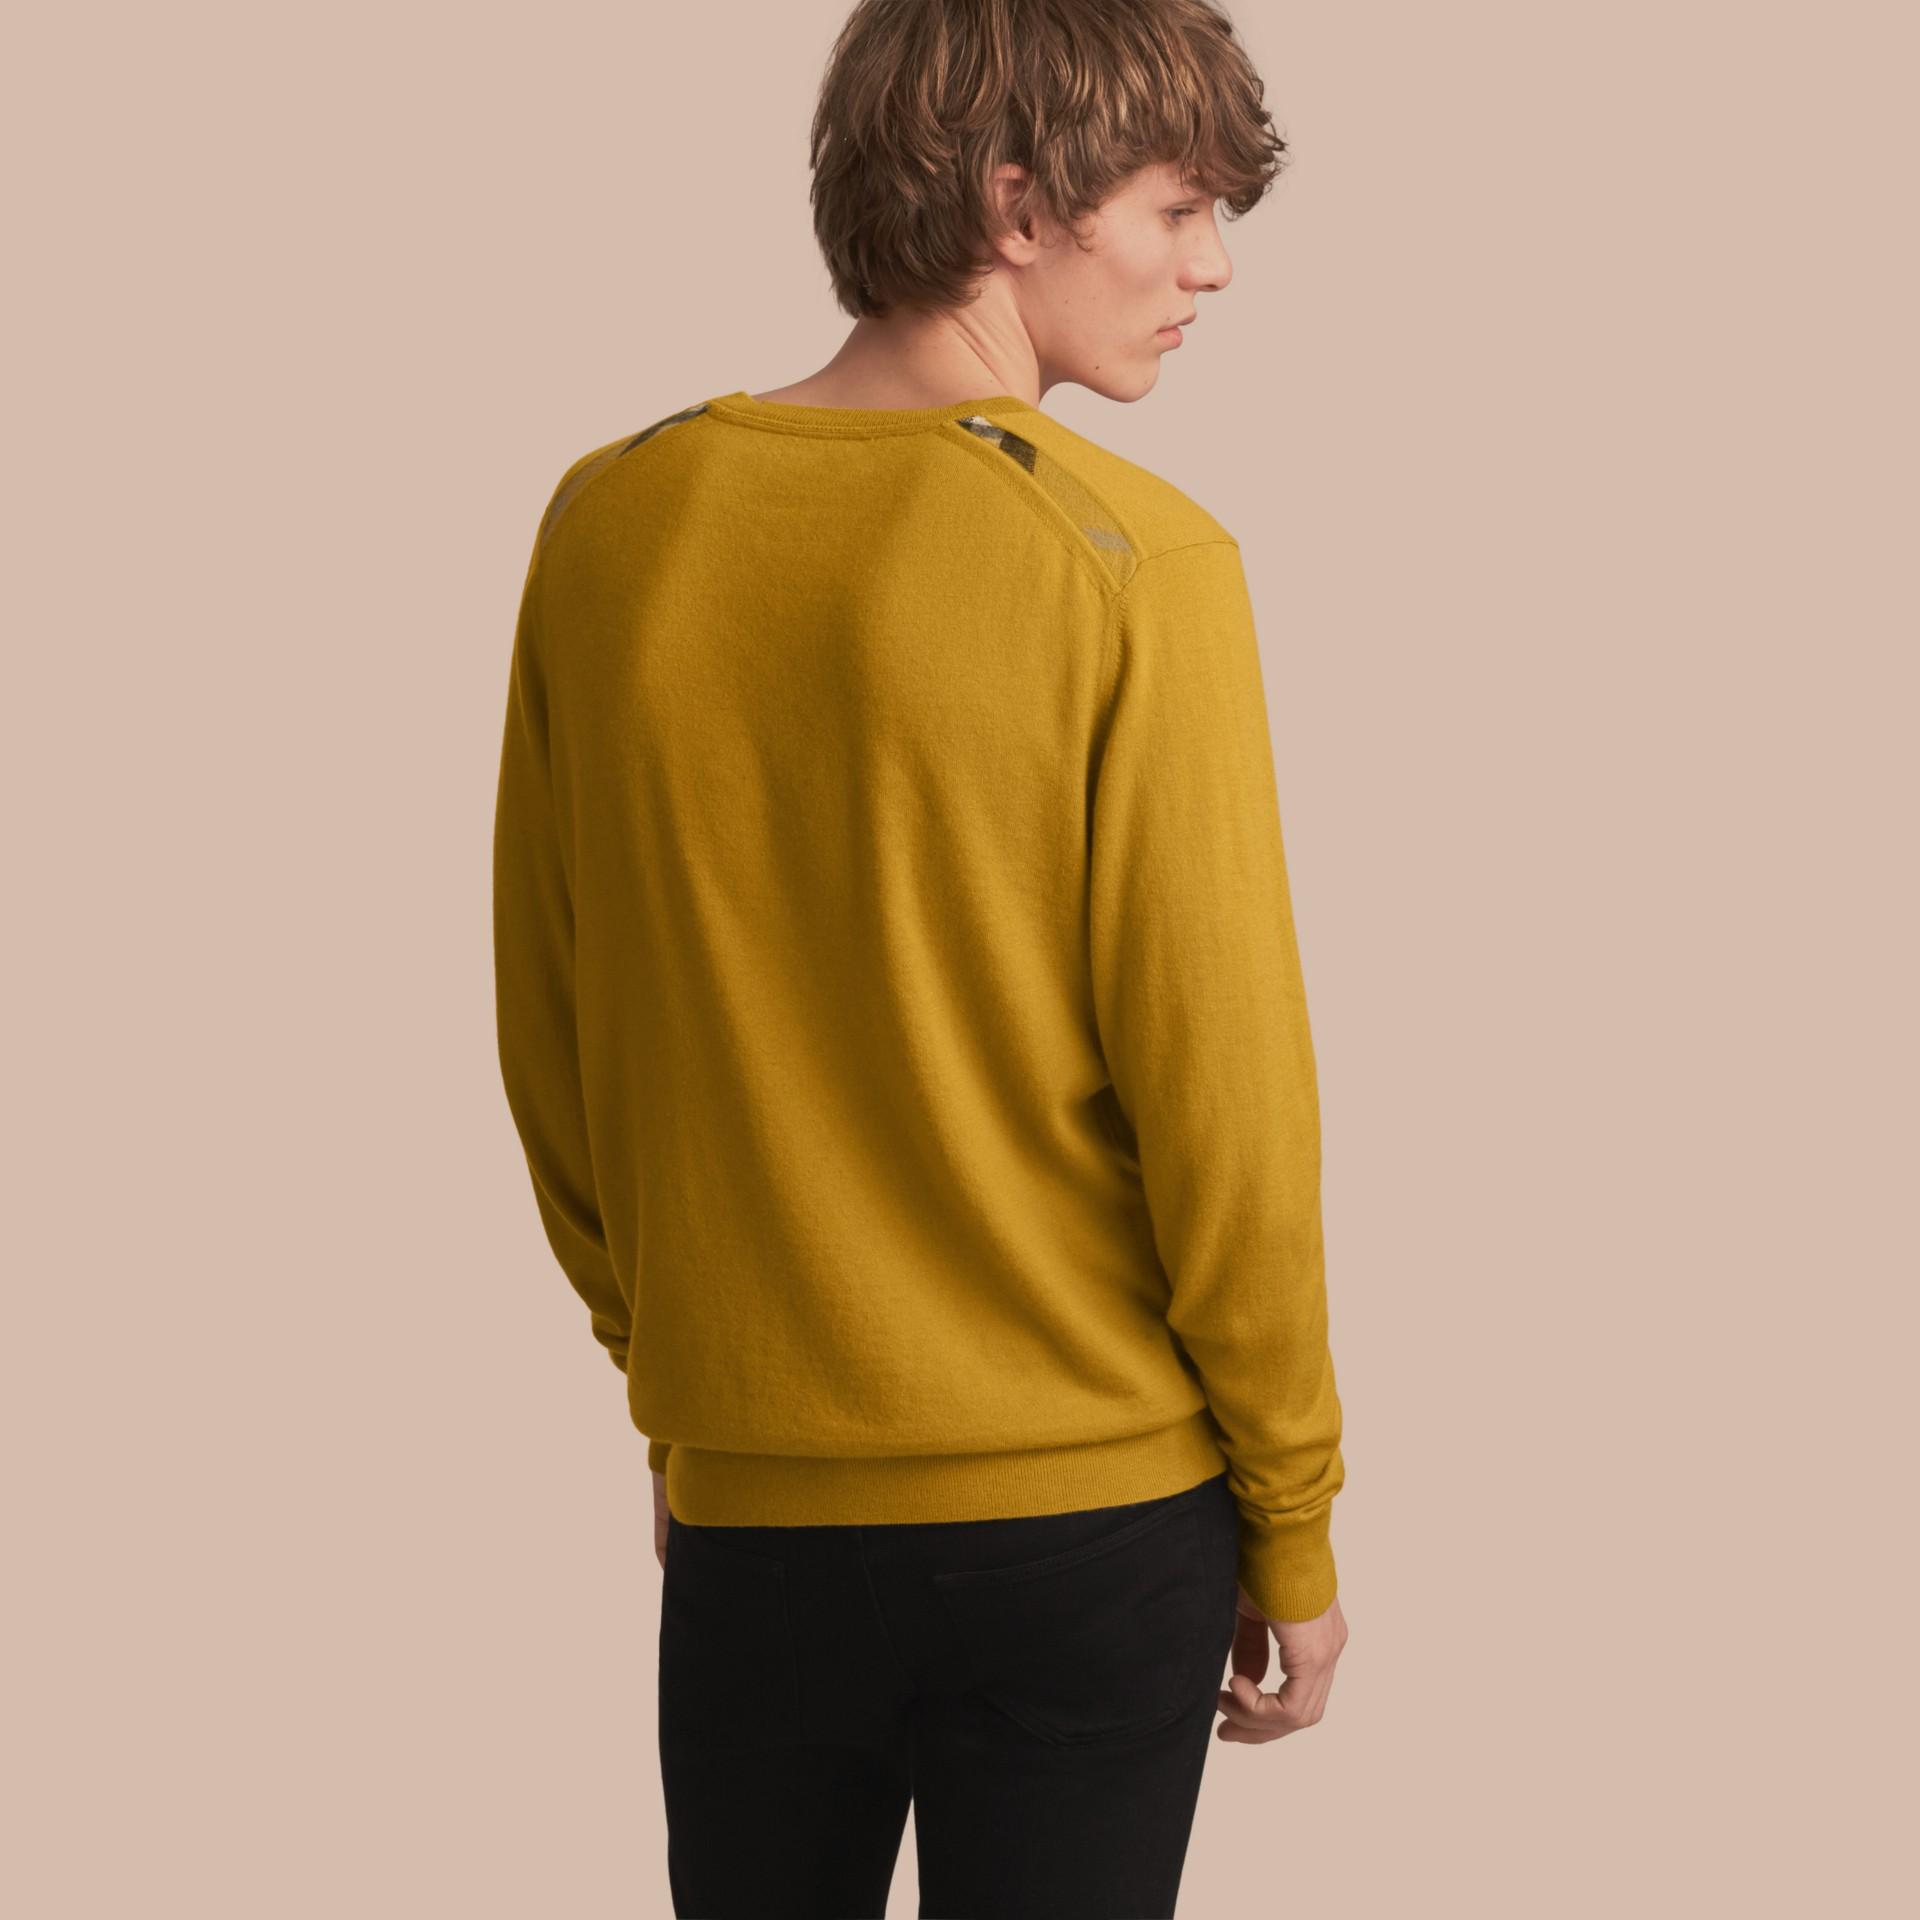 Lightweight Crew Neck Cashmere Sweater with Check Trim Cornflower Yellow - gallery image 1